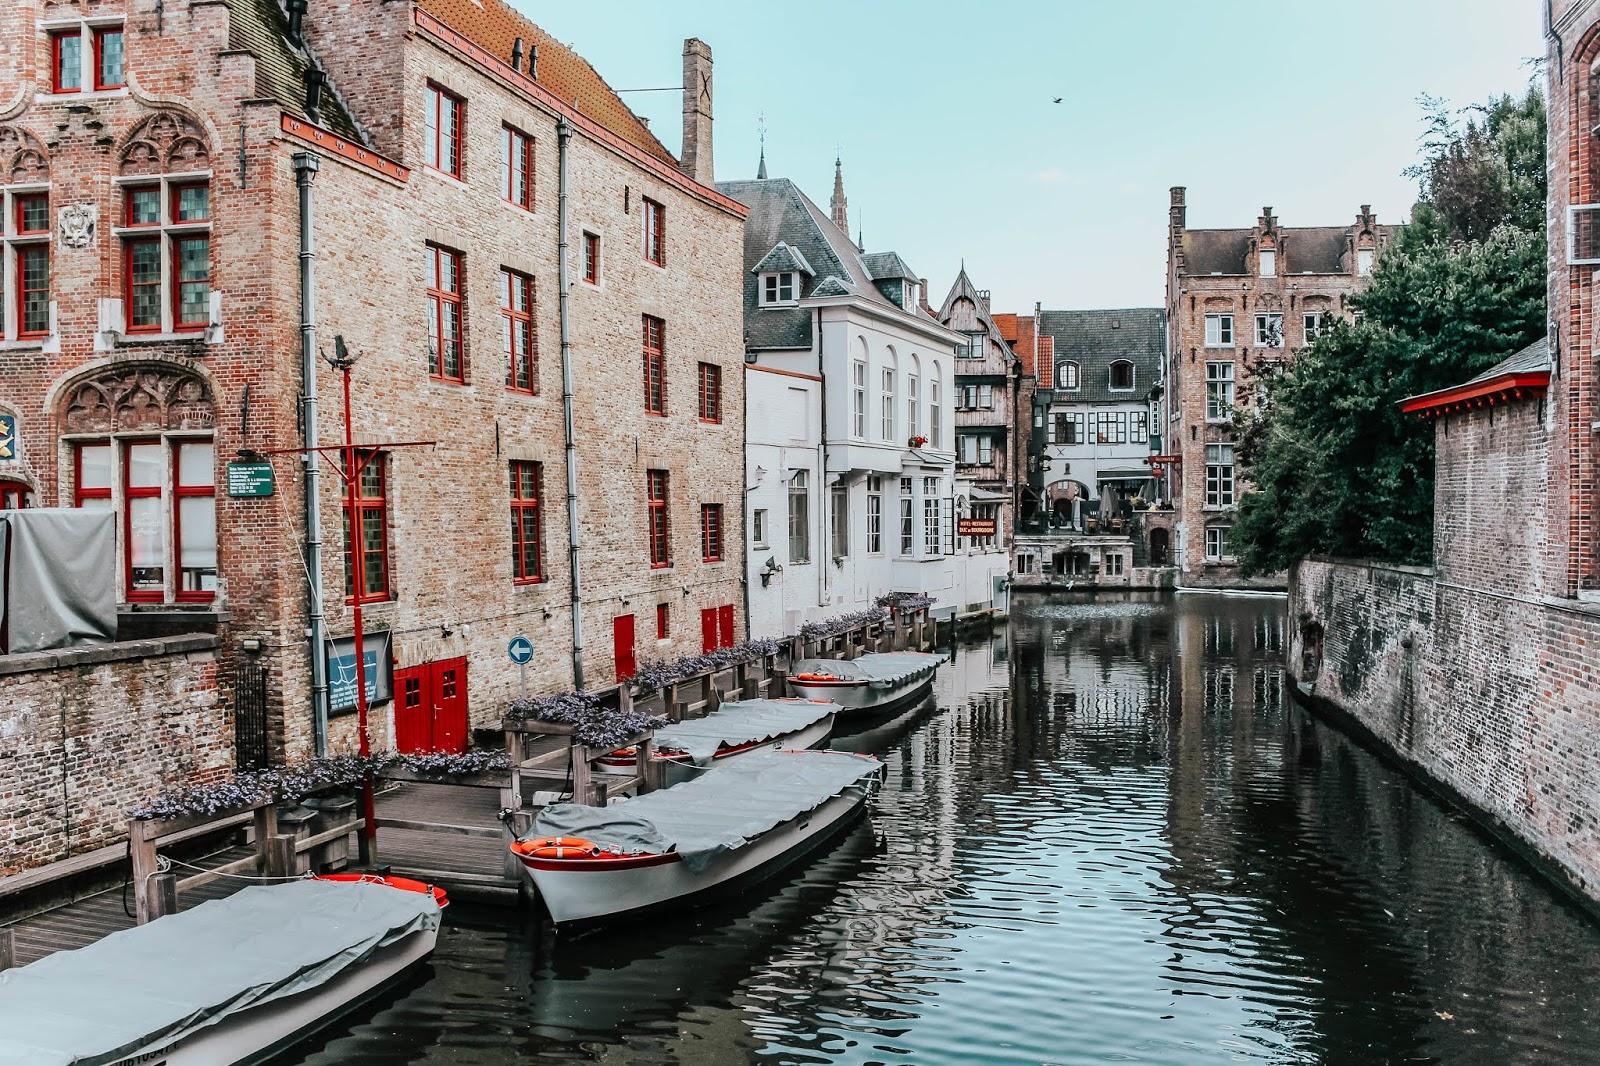 Brugge Belgium Canals in Summer 2018